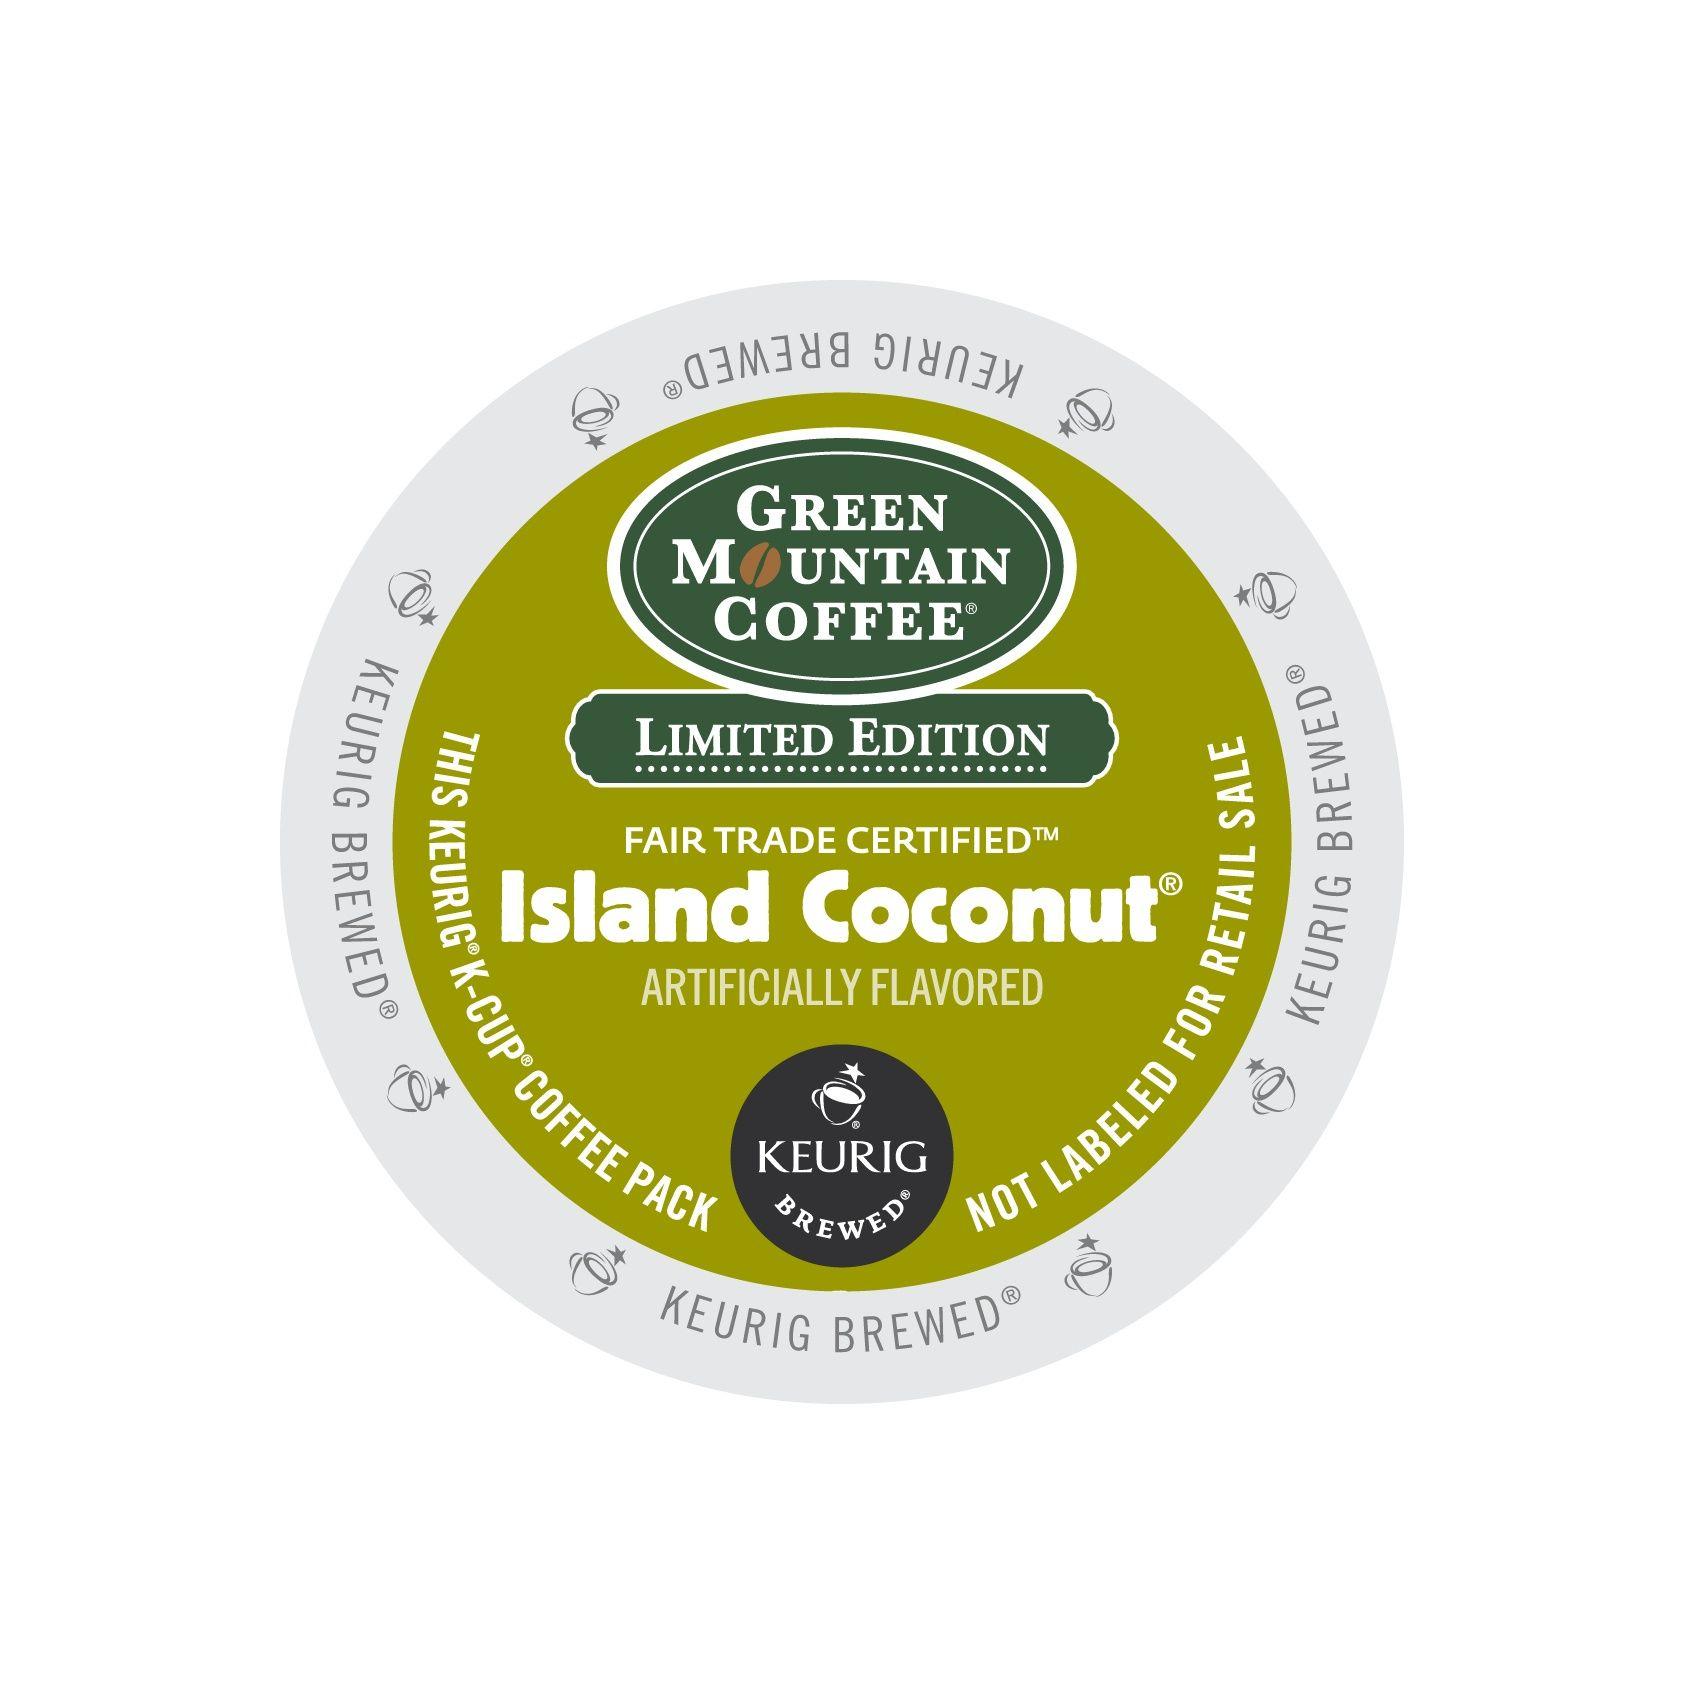 Green mountain coffee fair trade island coconut kcups k